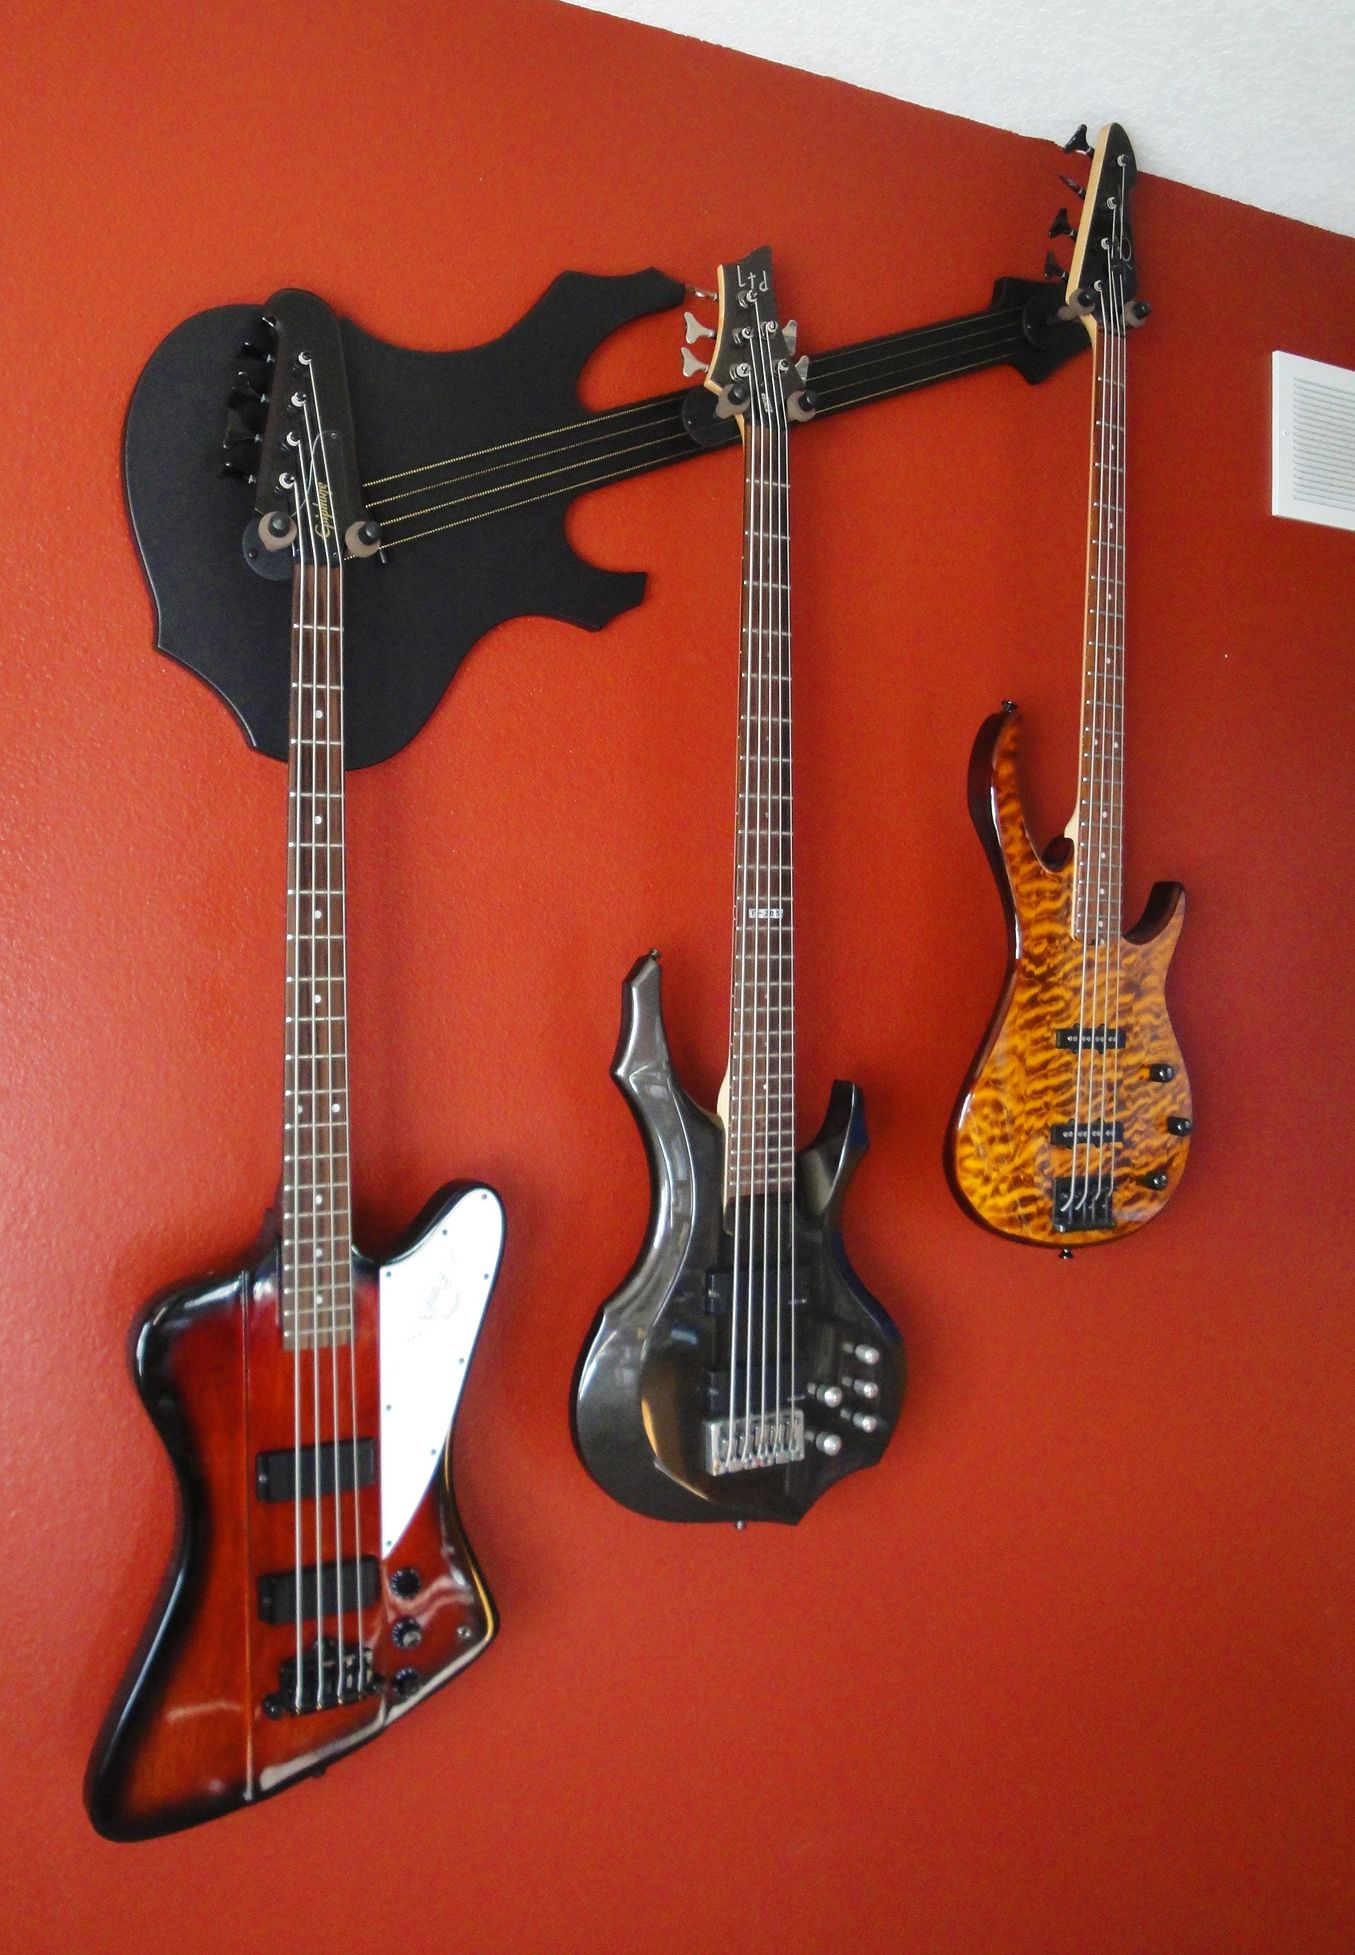 Wall Axe Custom Guitar Hangers Perchero De Guitarra Arte De Pared Diy Construcciones De Metal